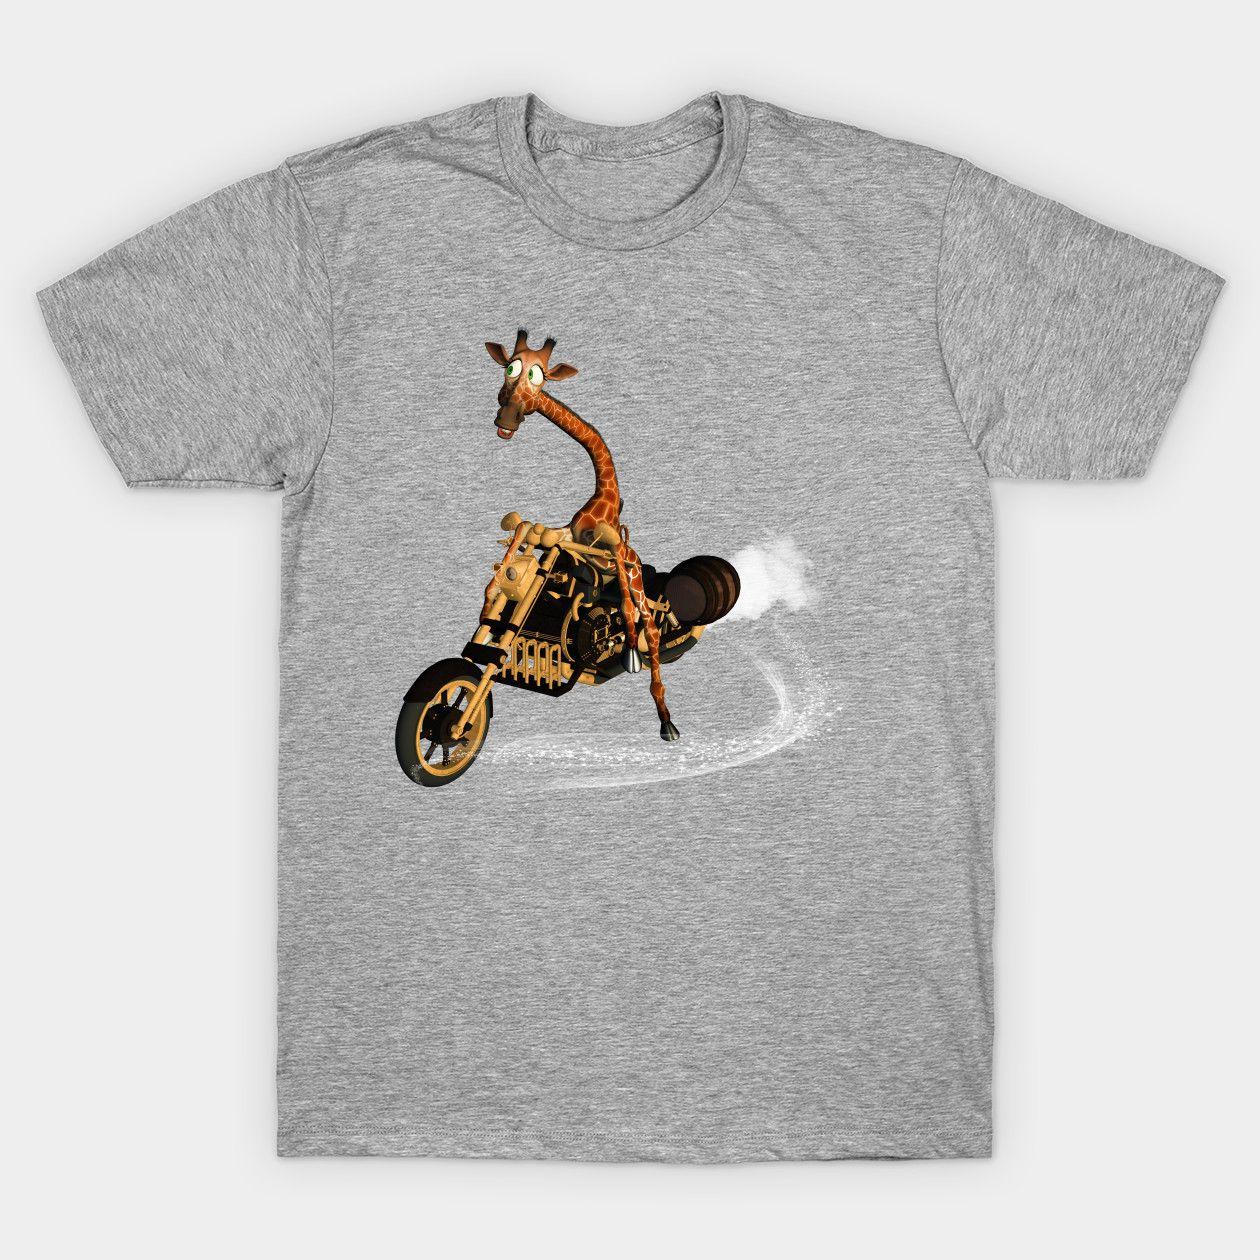 Funny Giraffe Giraffe Animal Cartoon Drive Motorcycle Fun Classic Shirts